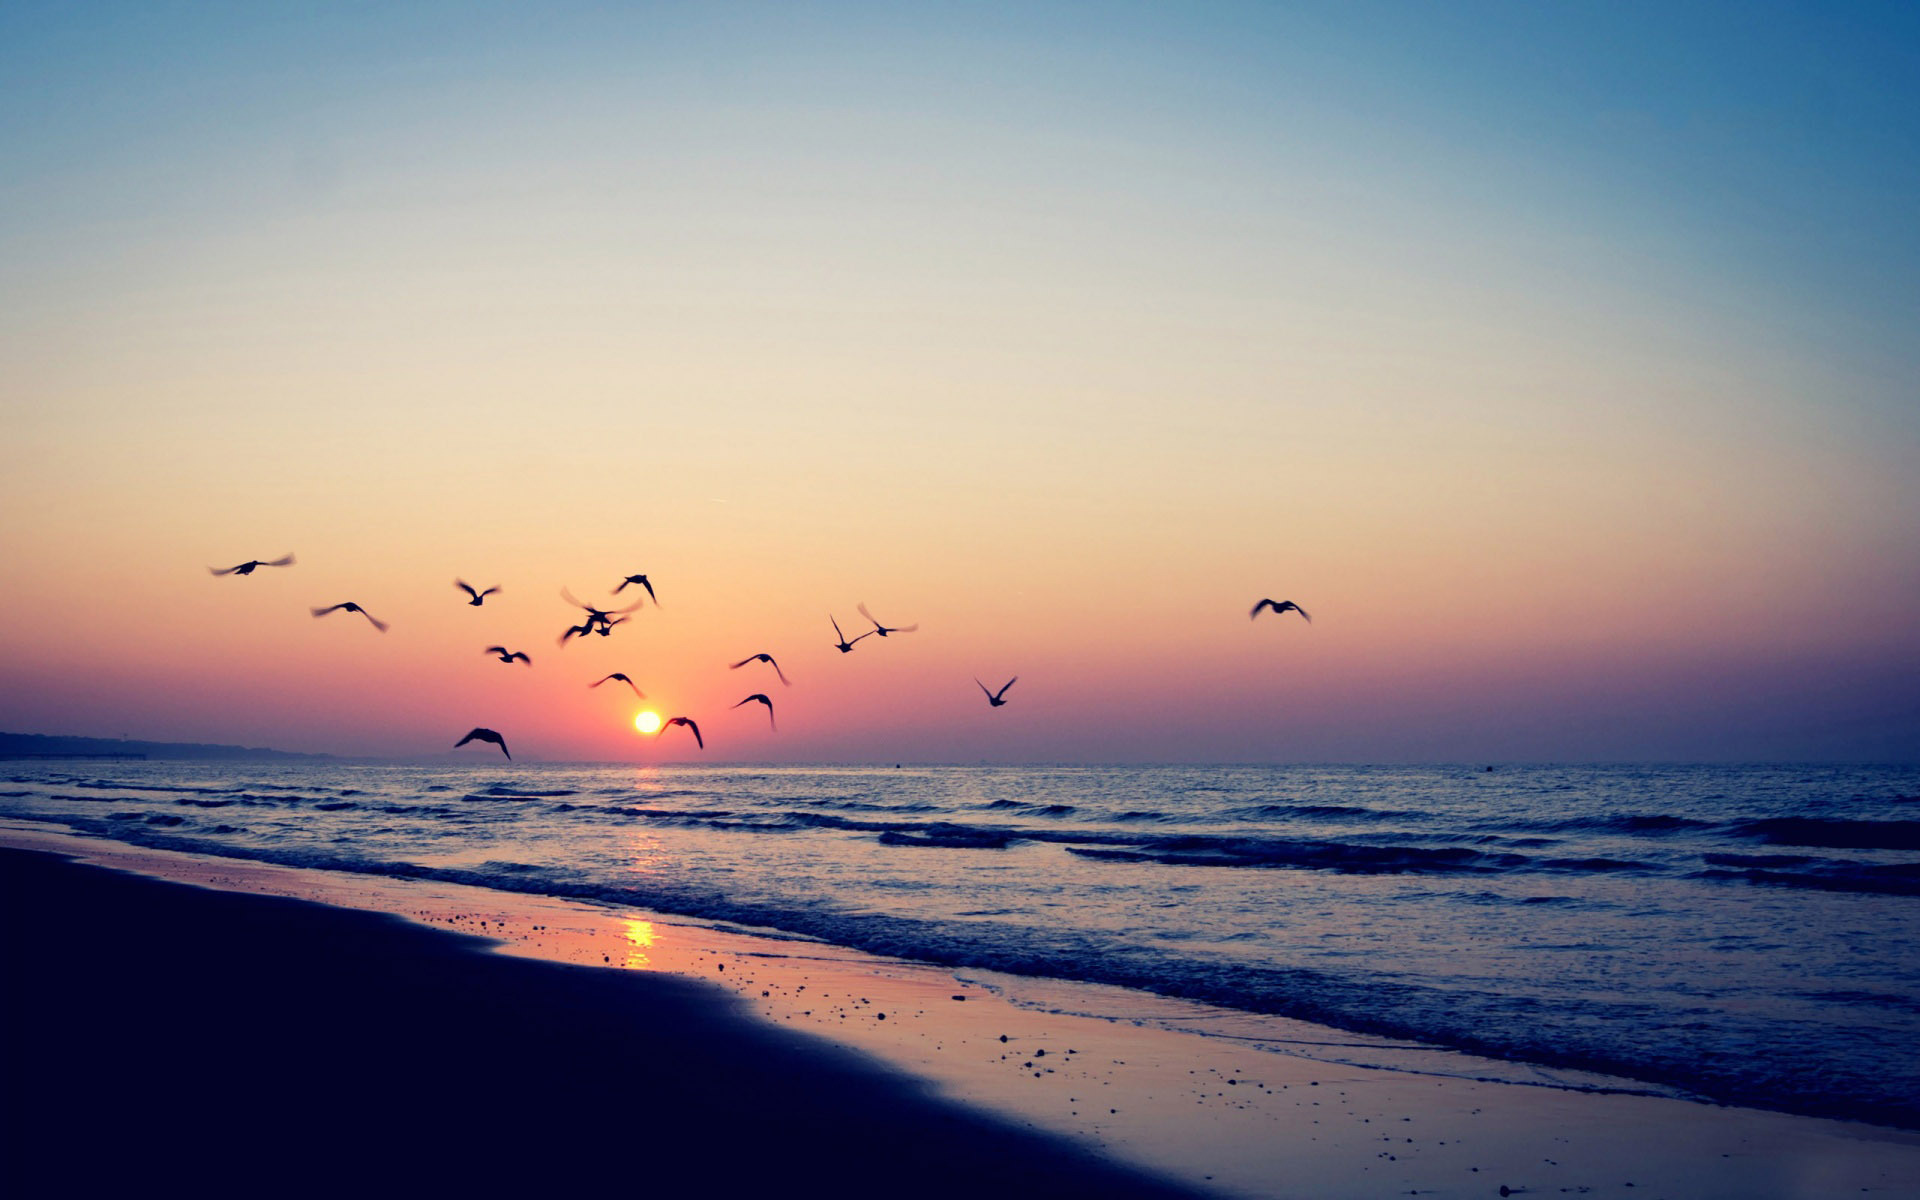 Beautiful Seagulls Wallpaper